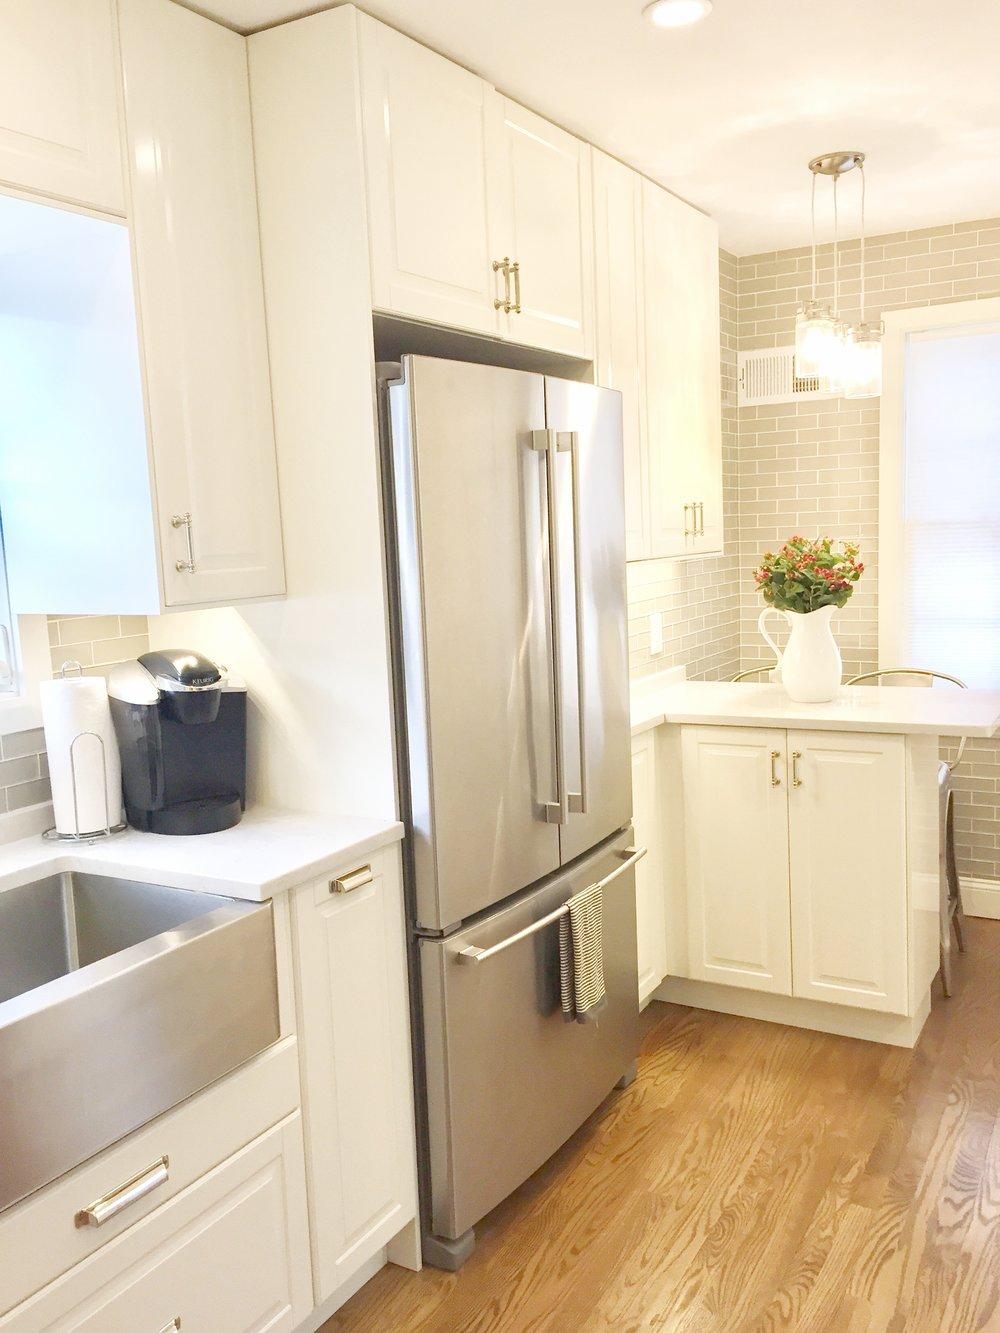 kitchenfridge.jpg